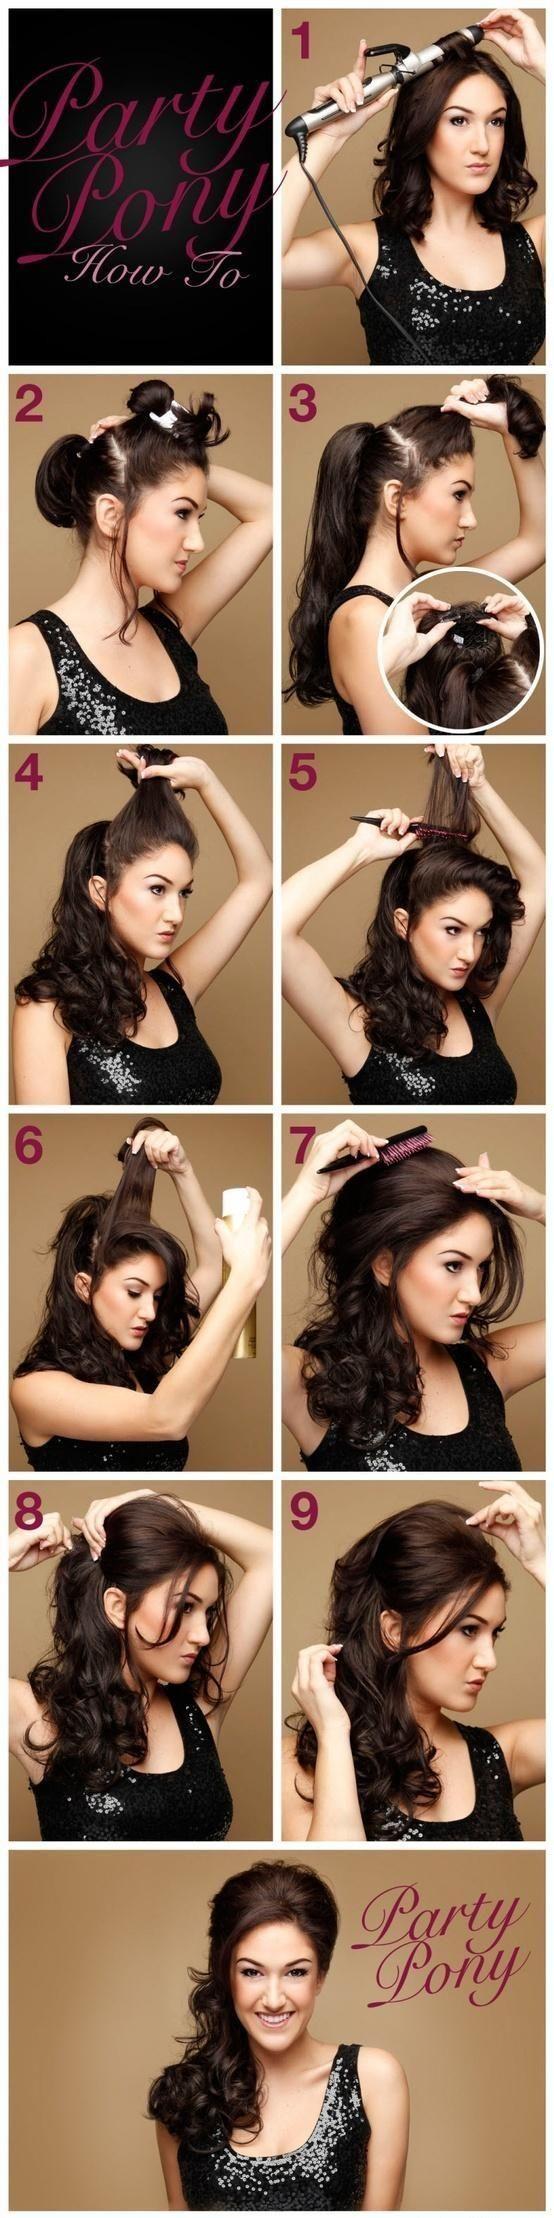 DIY Party Pony Hairstyle (i really like the way #8 looks)